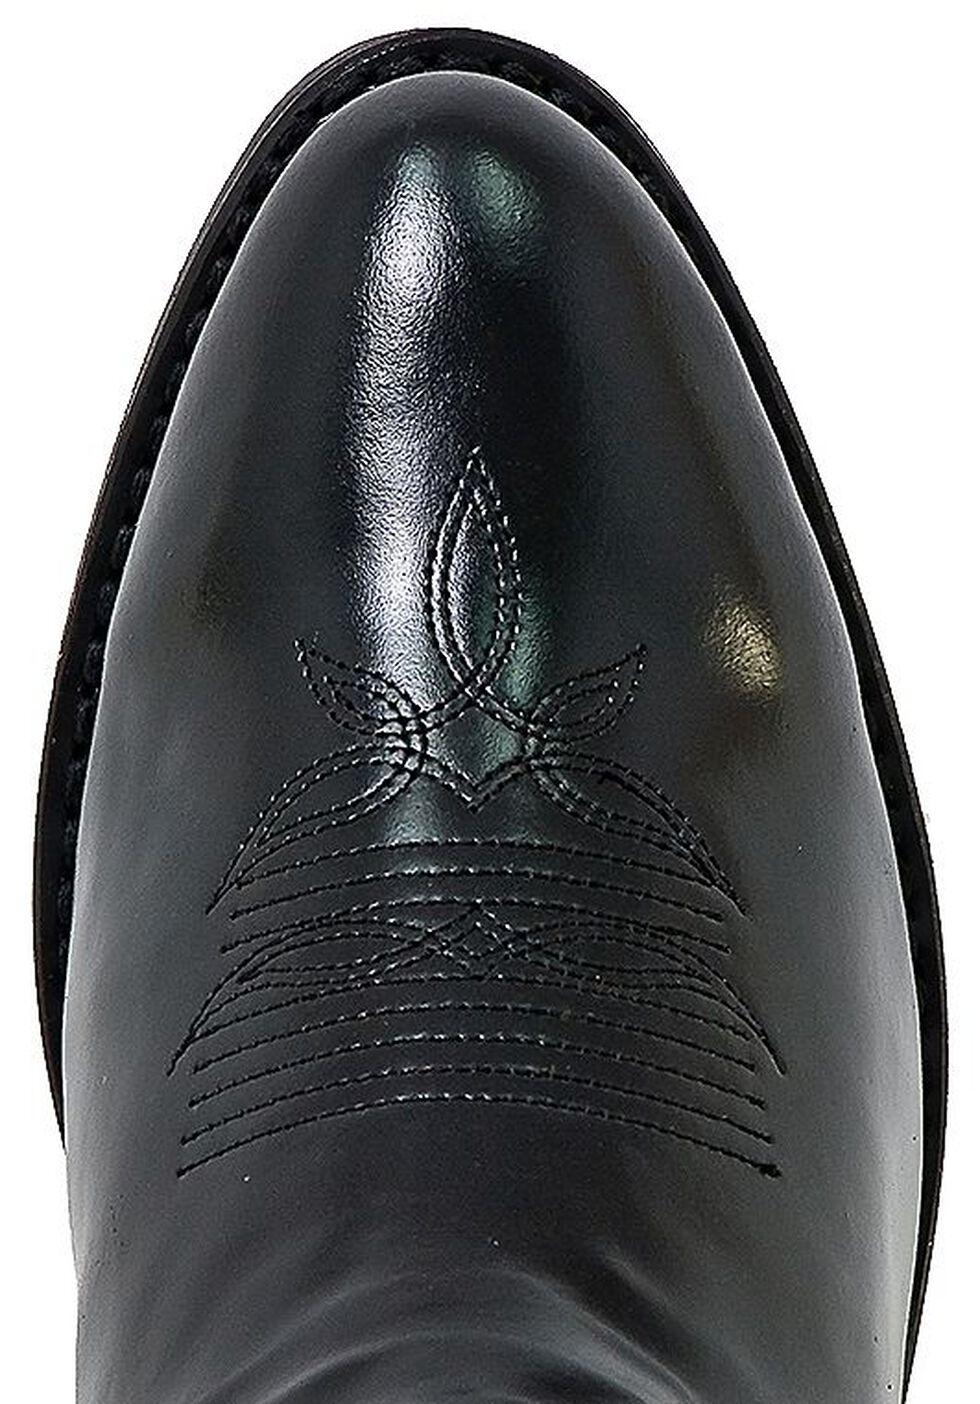 Laredo Classic Western Cowgirl Boots - Round Toe, Black, hi-res